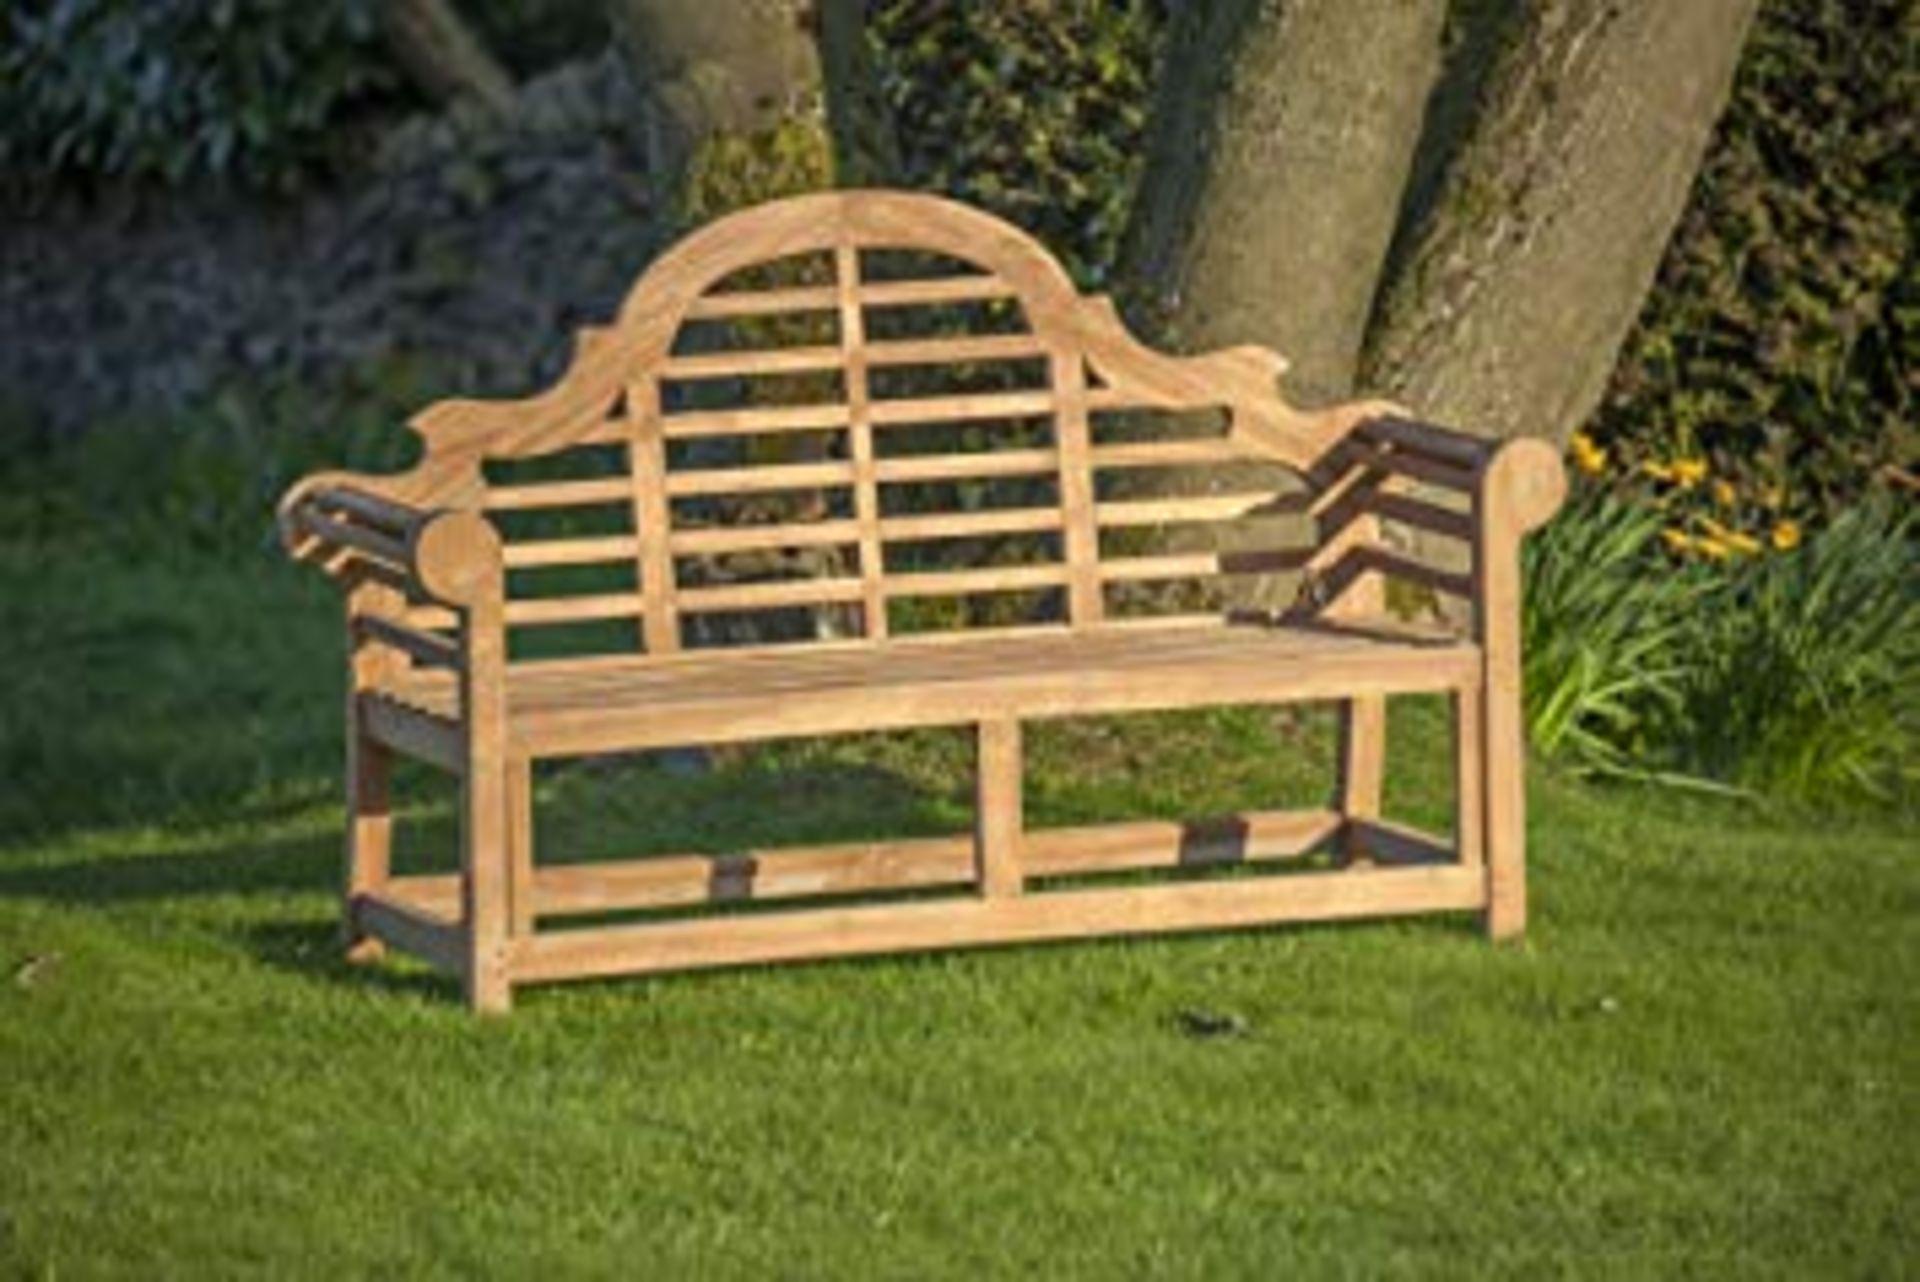 Lot 32037 - V Brand New Teak - Solid Teak Lutyens Style Marlborough Bench Made From Grade A Plantation Teak (ISP